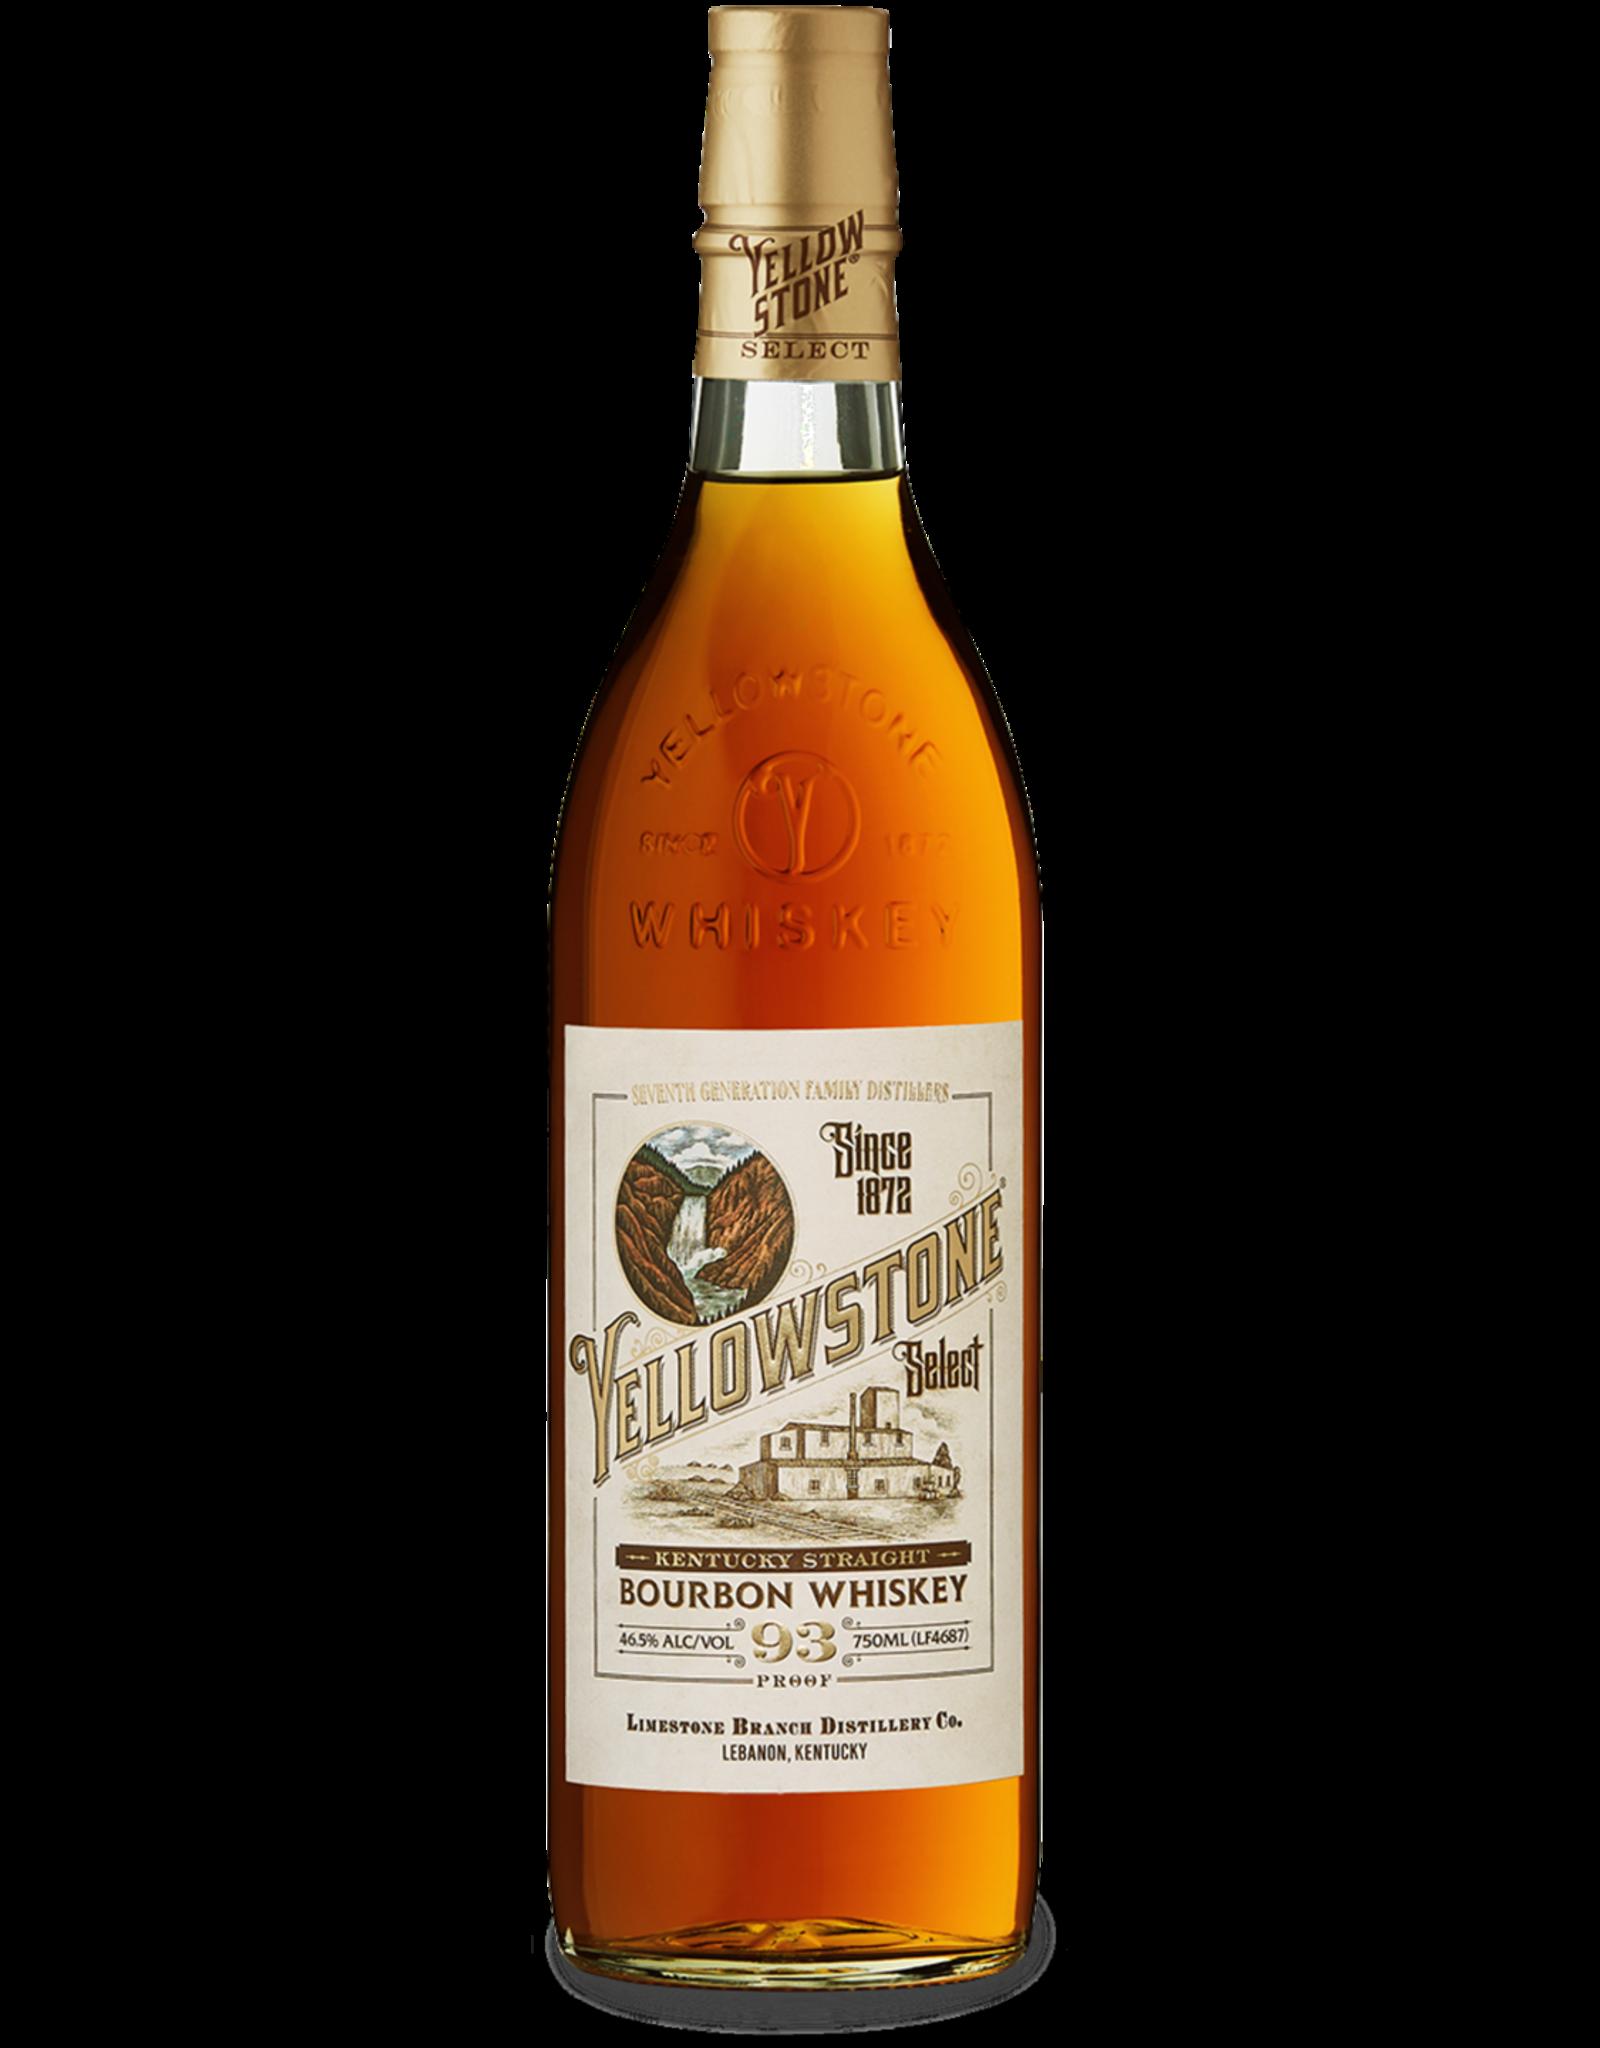 Limestone Branch Distillery Yellowstone Bourbon 93 proof